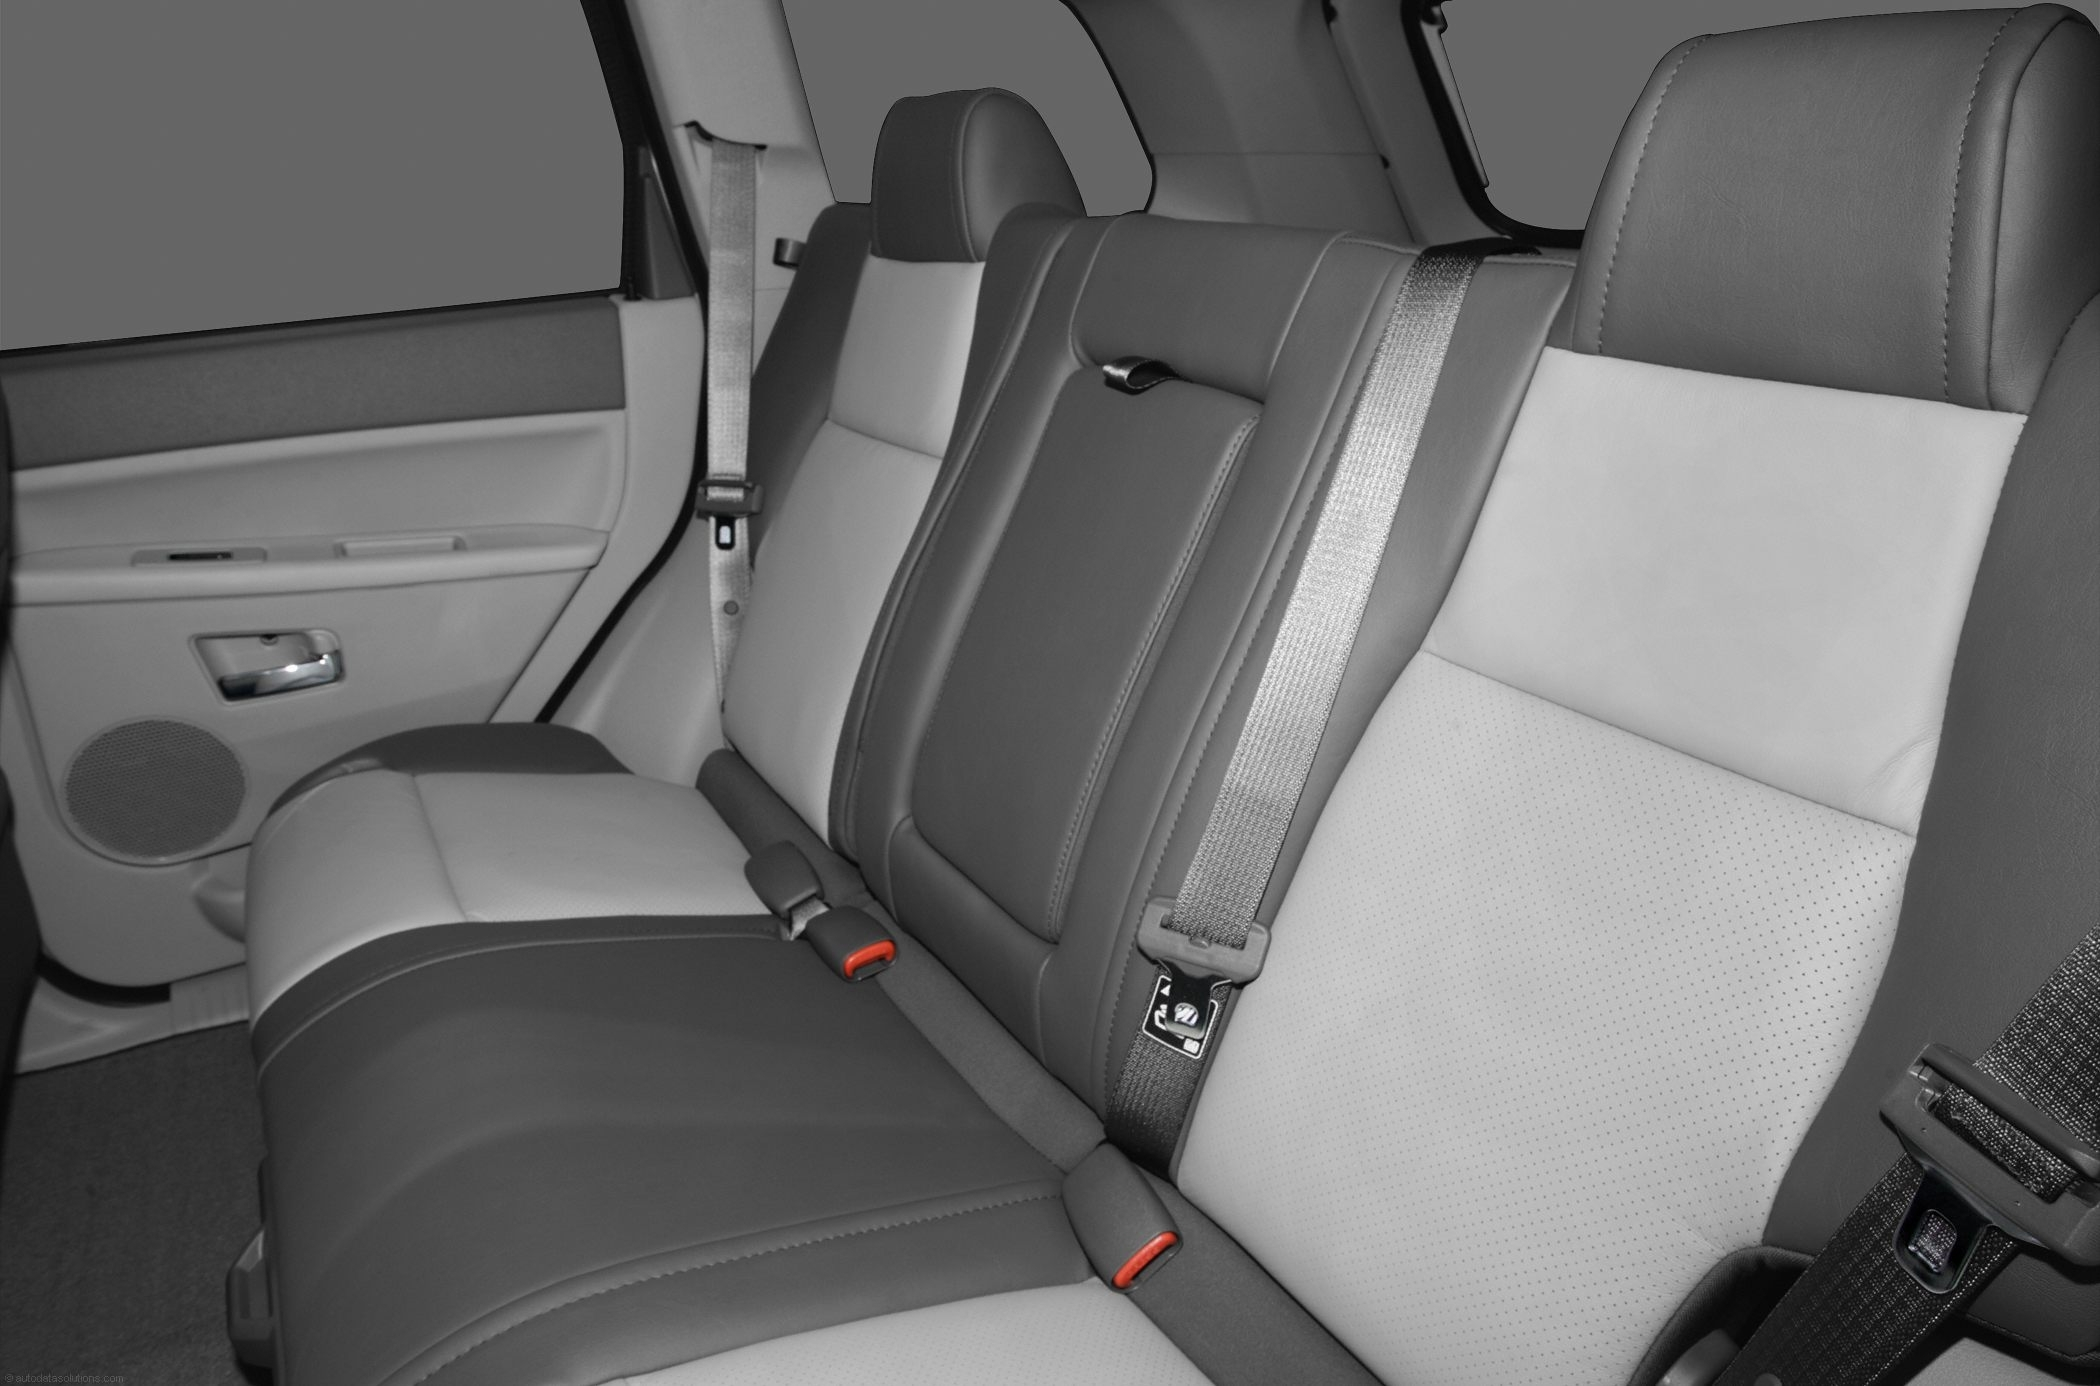 jeep grand cherokee invoice price invoice template free 2016 jeep invoice pricing